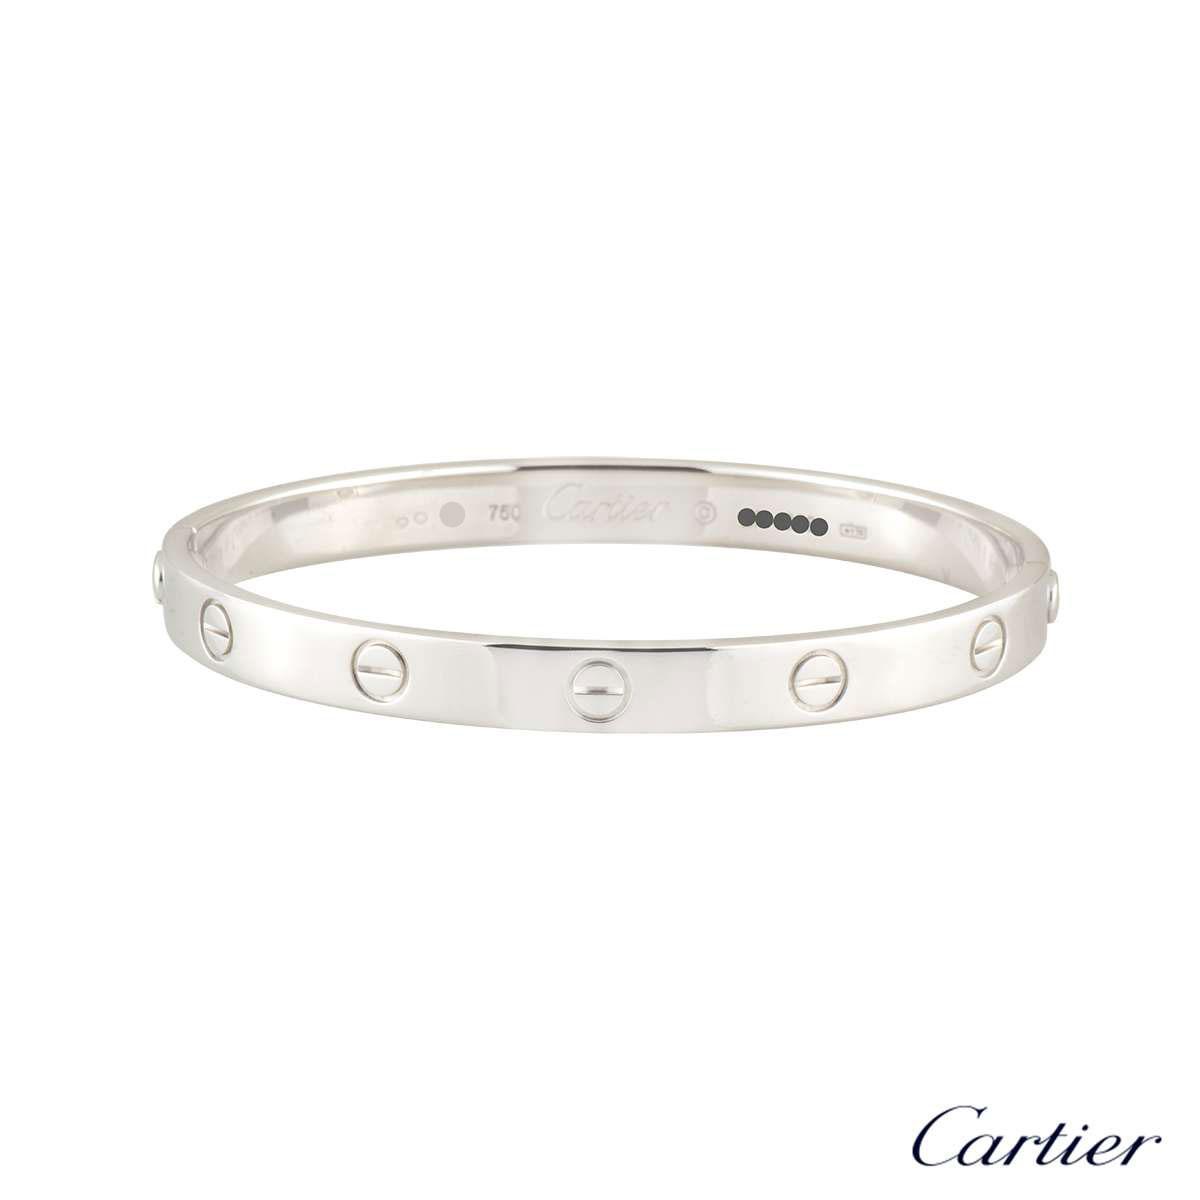 Cartier White Gold Plain Love Bracelet Size 16 B6035416